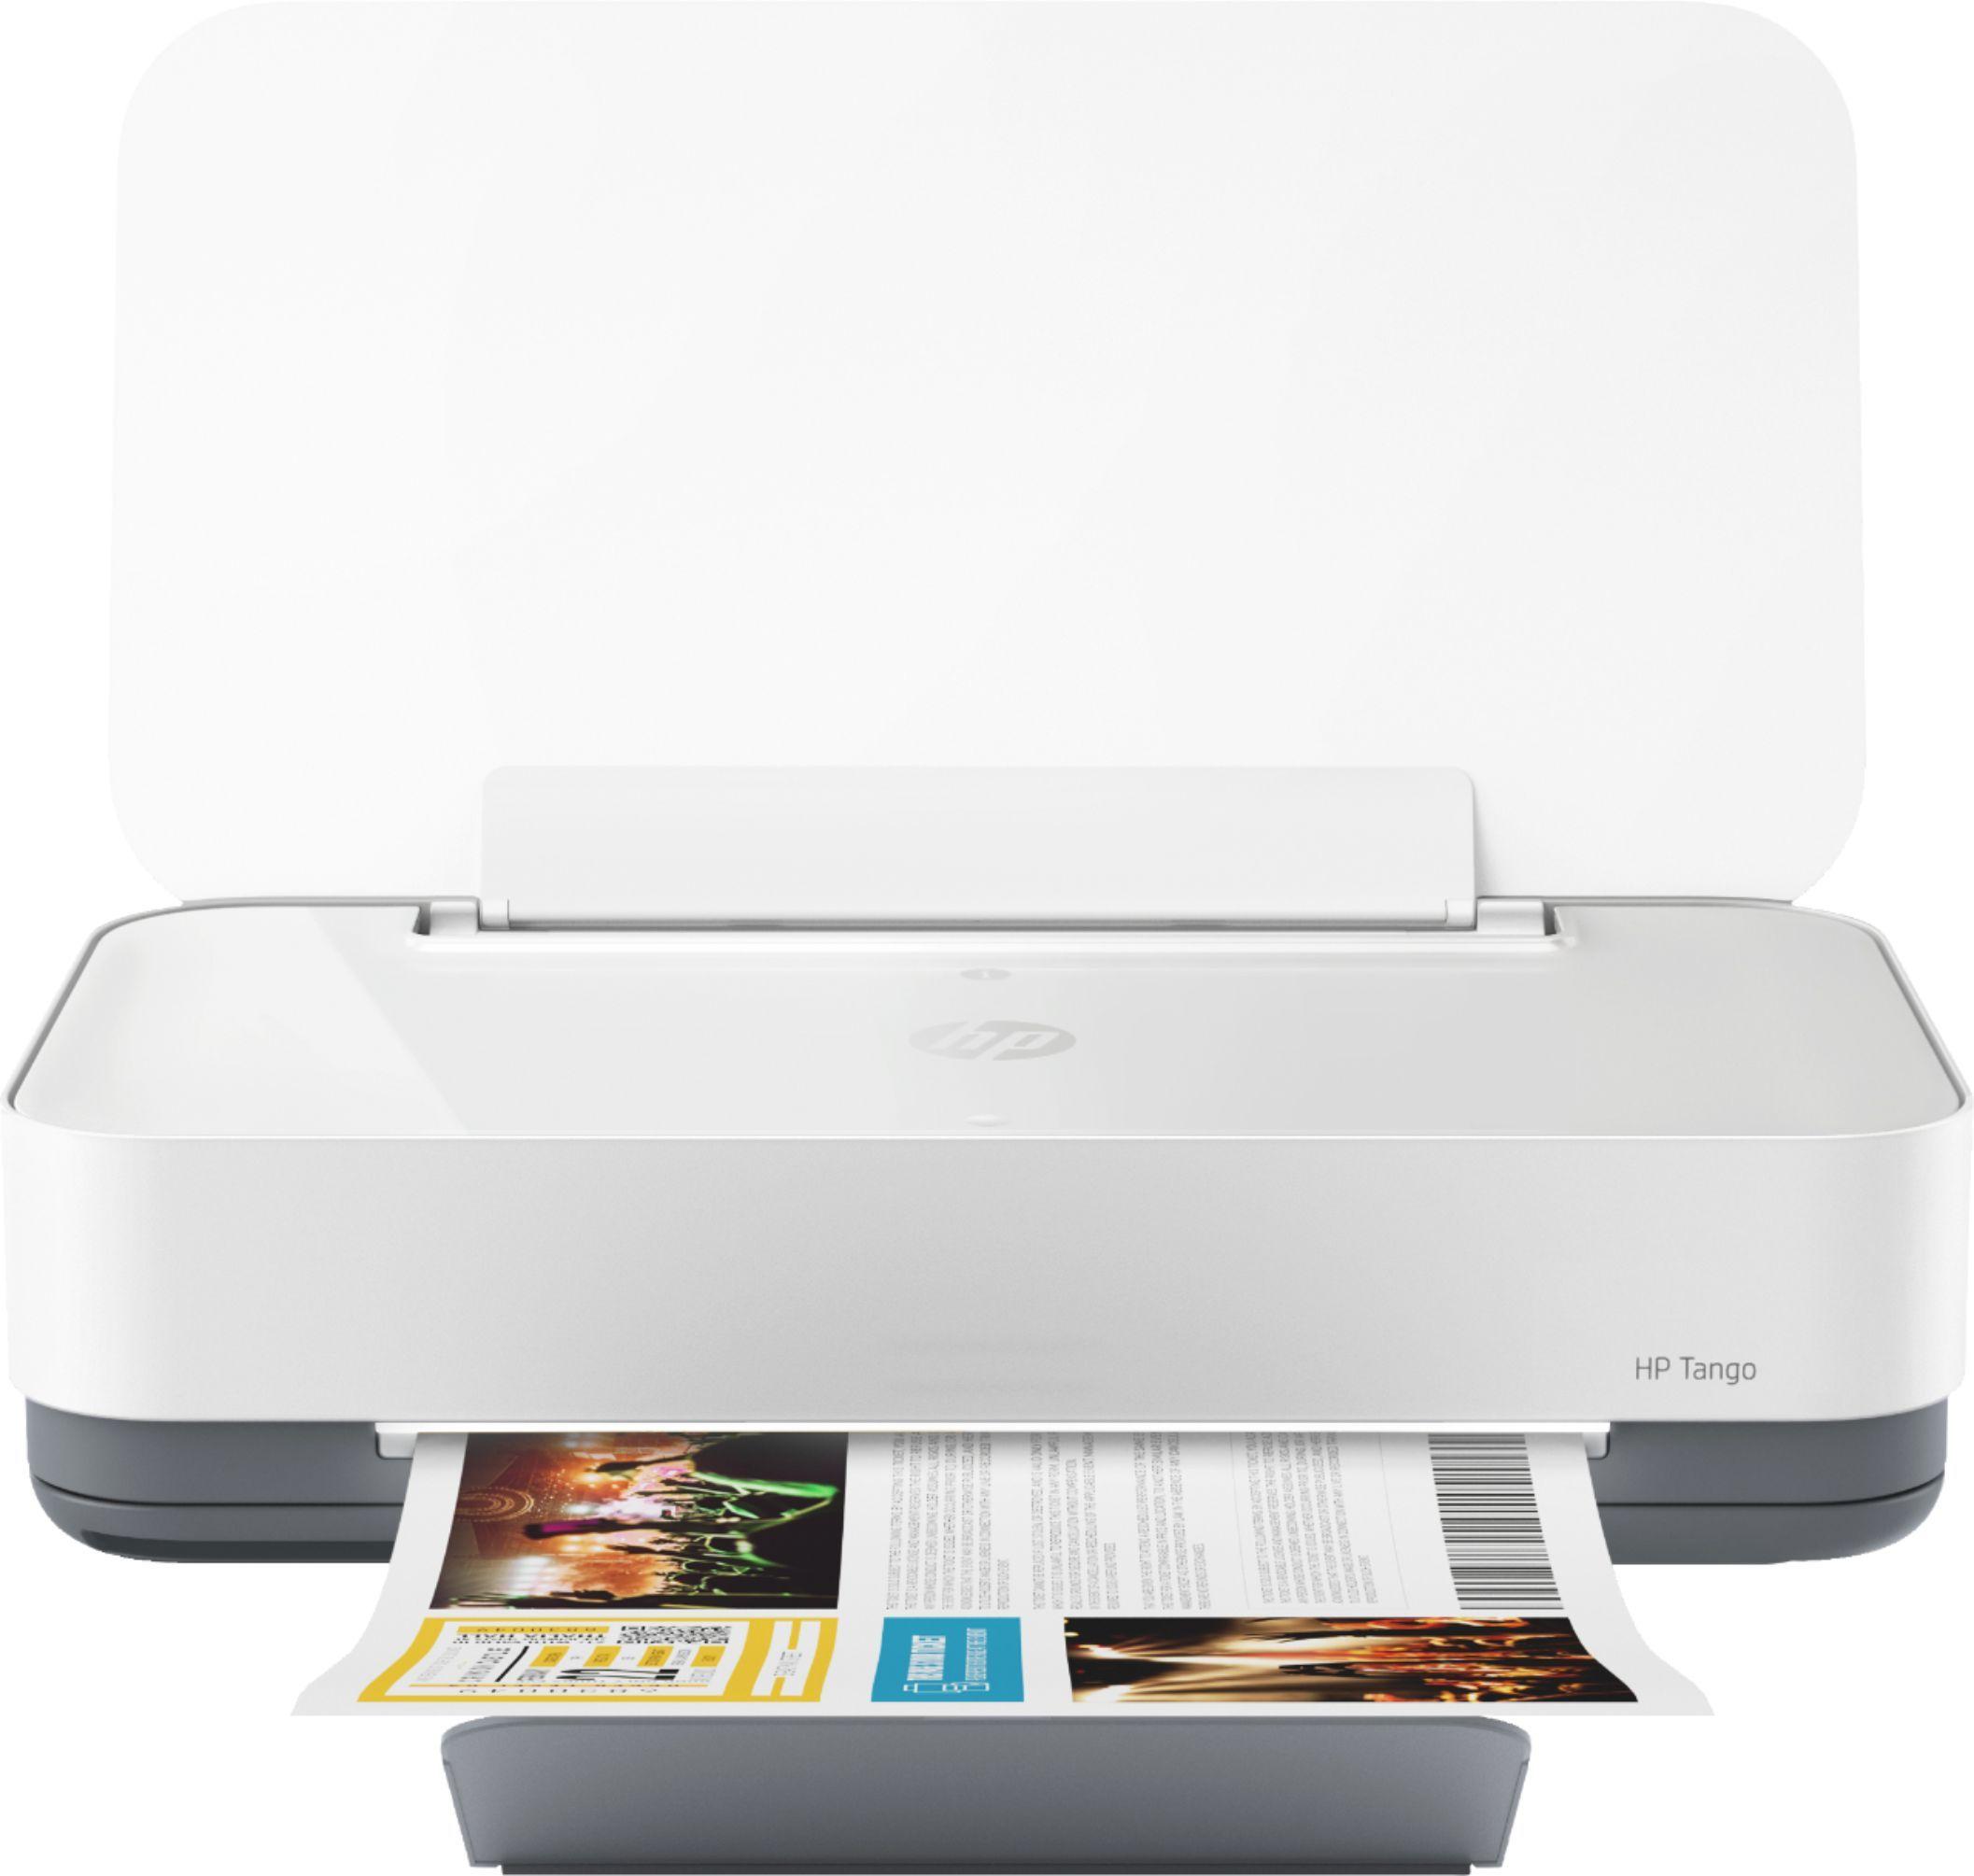 HP Tango Wireless Instant Ink Ready Inkjet Printer Wisp